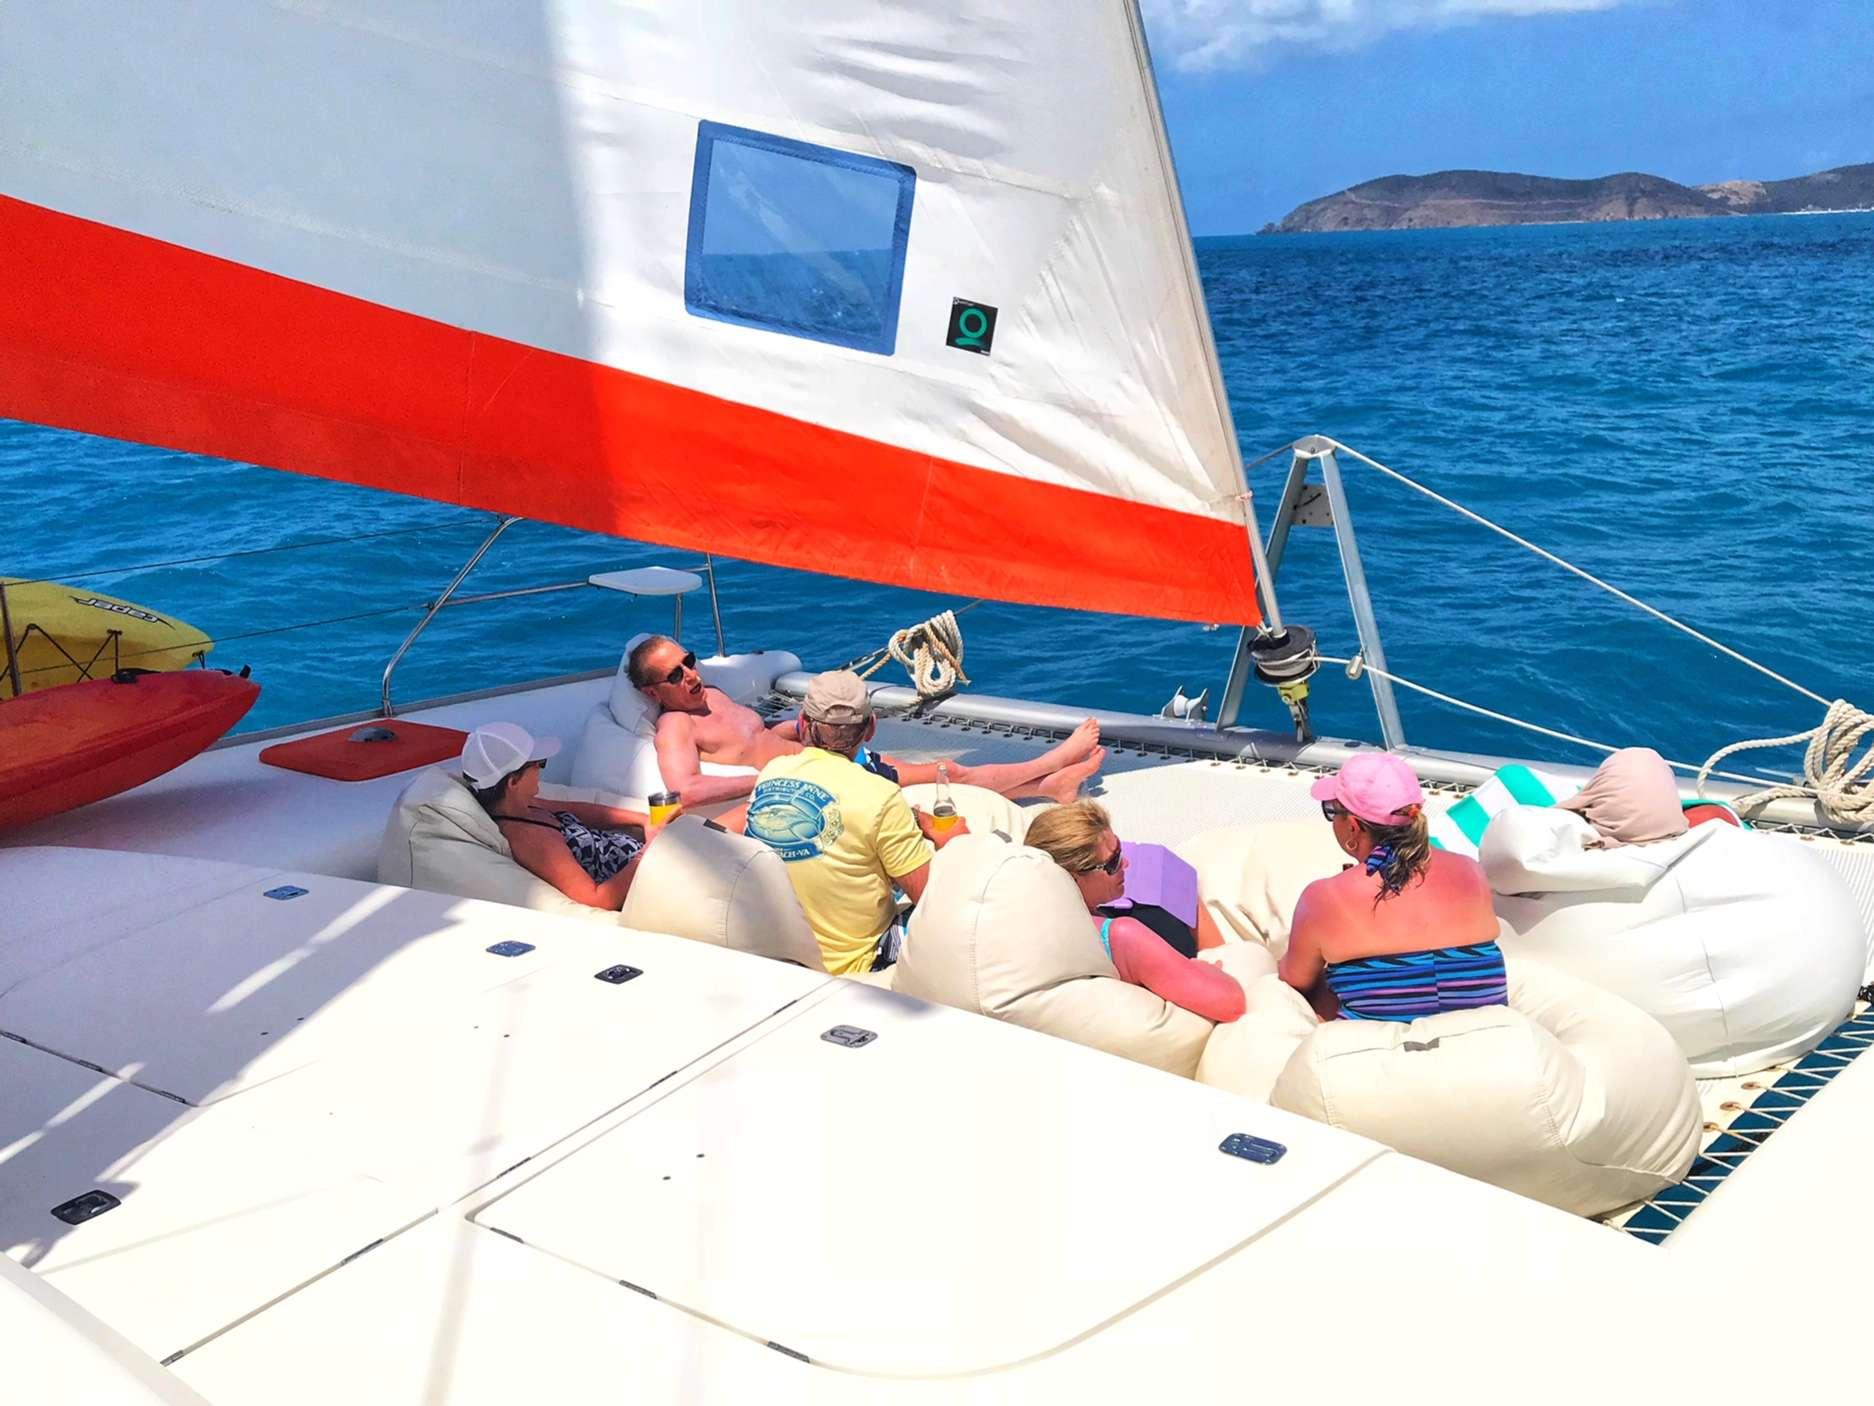 Catamaran Yacht 'STARFISH' Good friends, good times., 6 PAX, 2 Crew, 46.00 Ft, 14.00 Meters, Built 2008, Leopard, Refit Year 2019